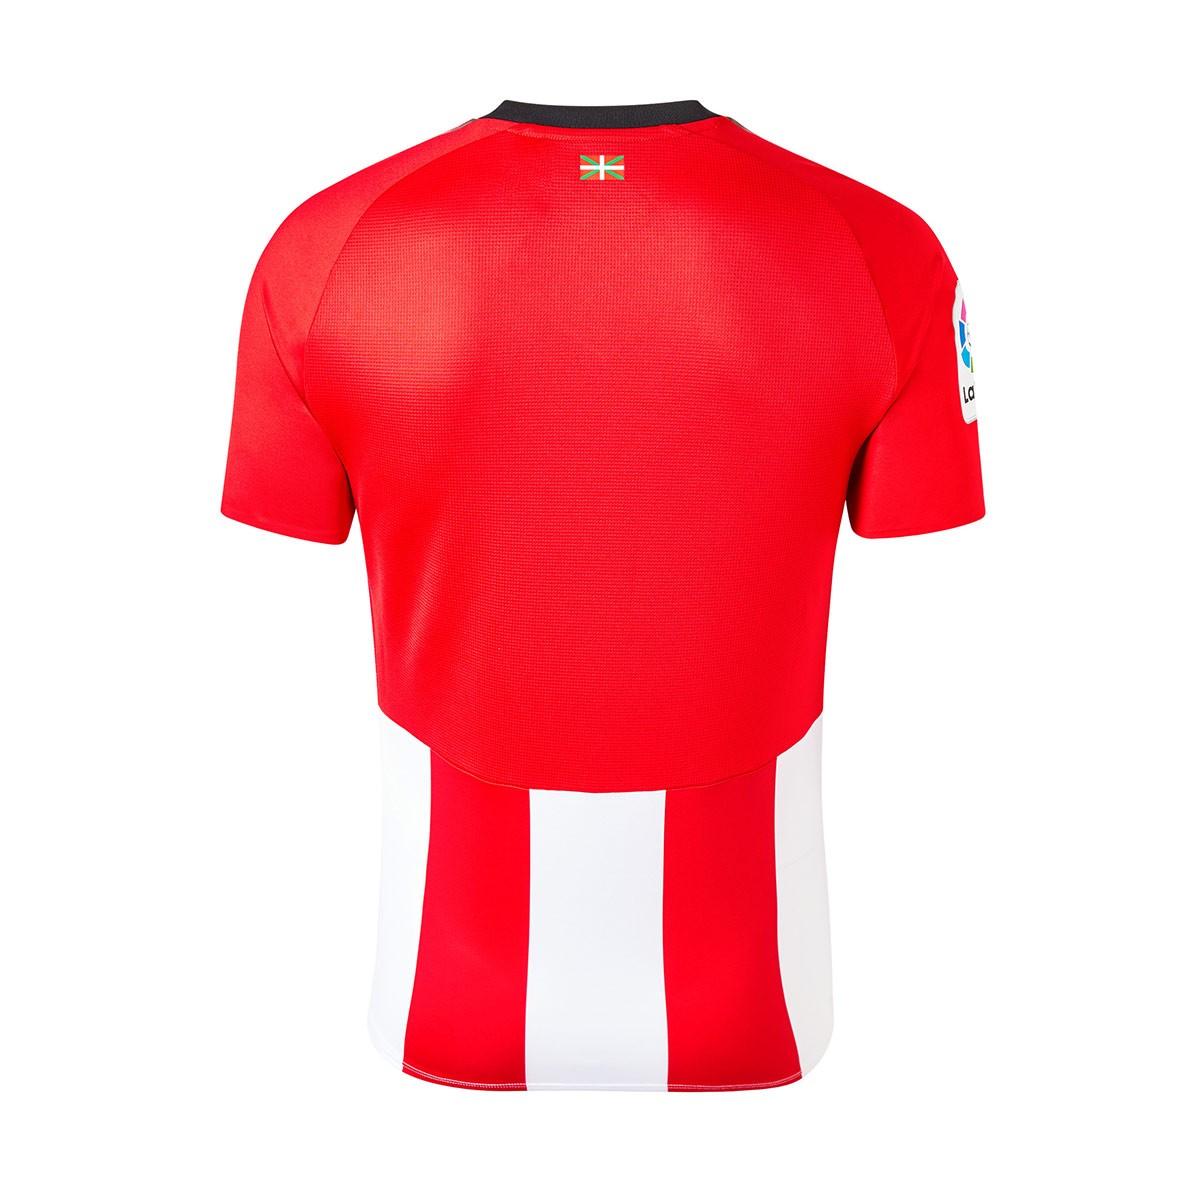 557bea92006d2 Camiseta New Balance AC Bilbao Primera Equipación 2018-2019 White-Red -  Tienda de fútbol Fútbol Emotion